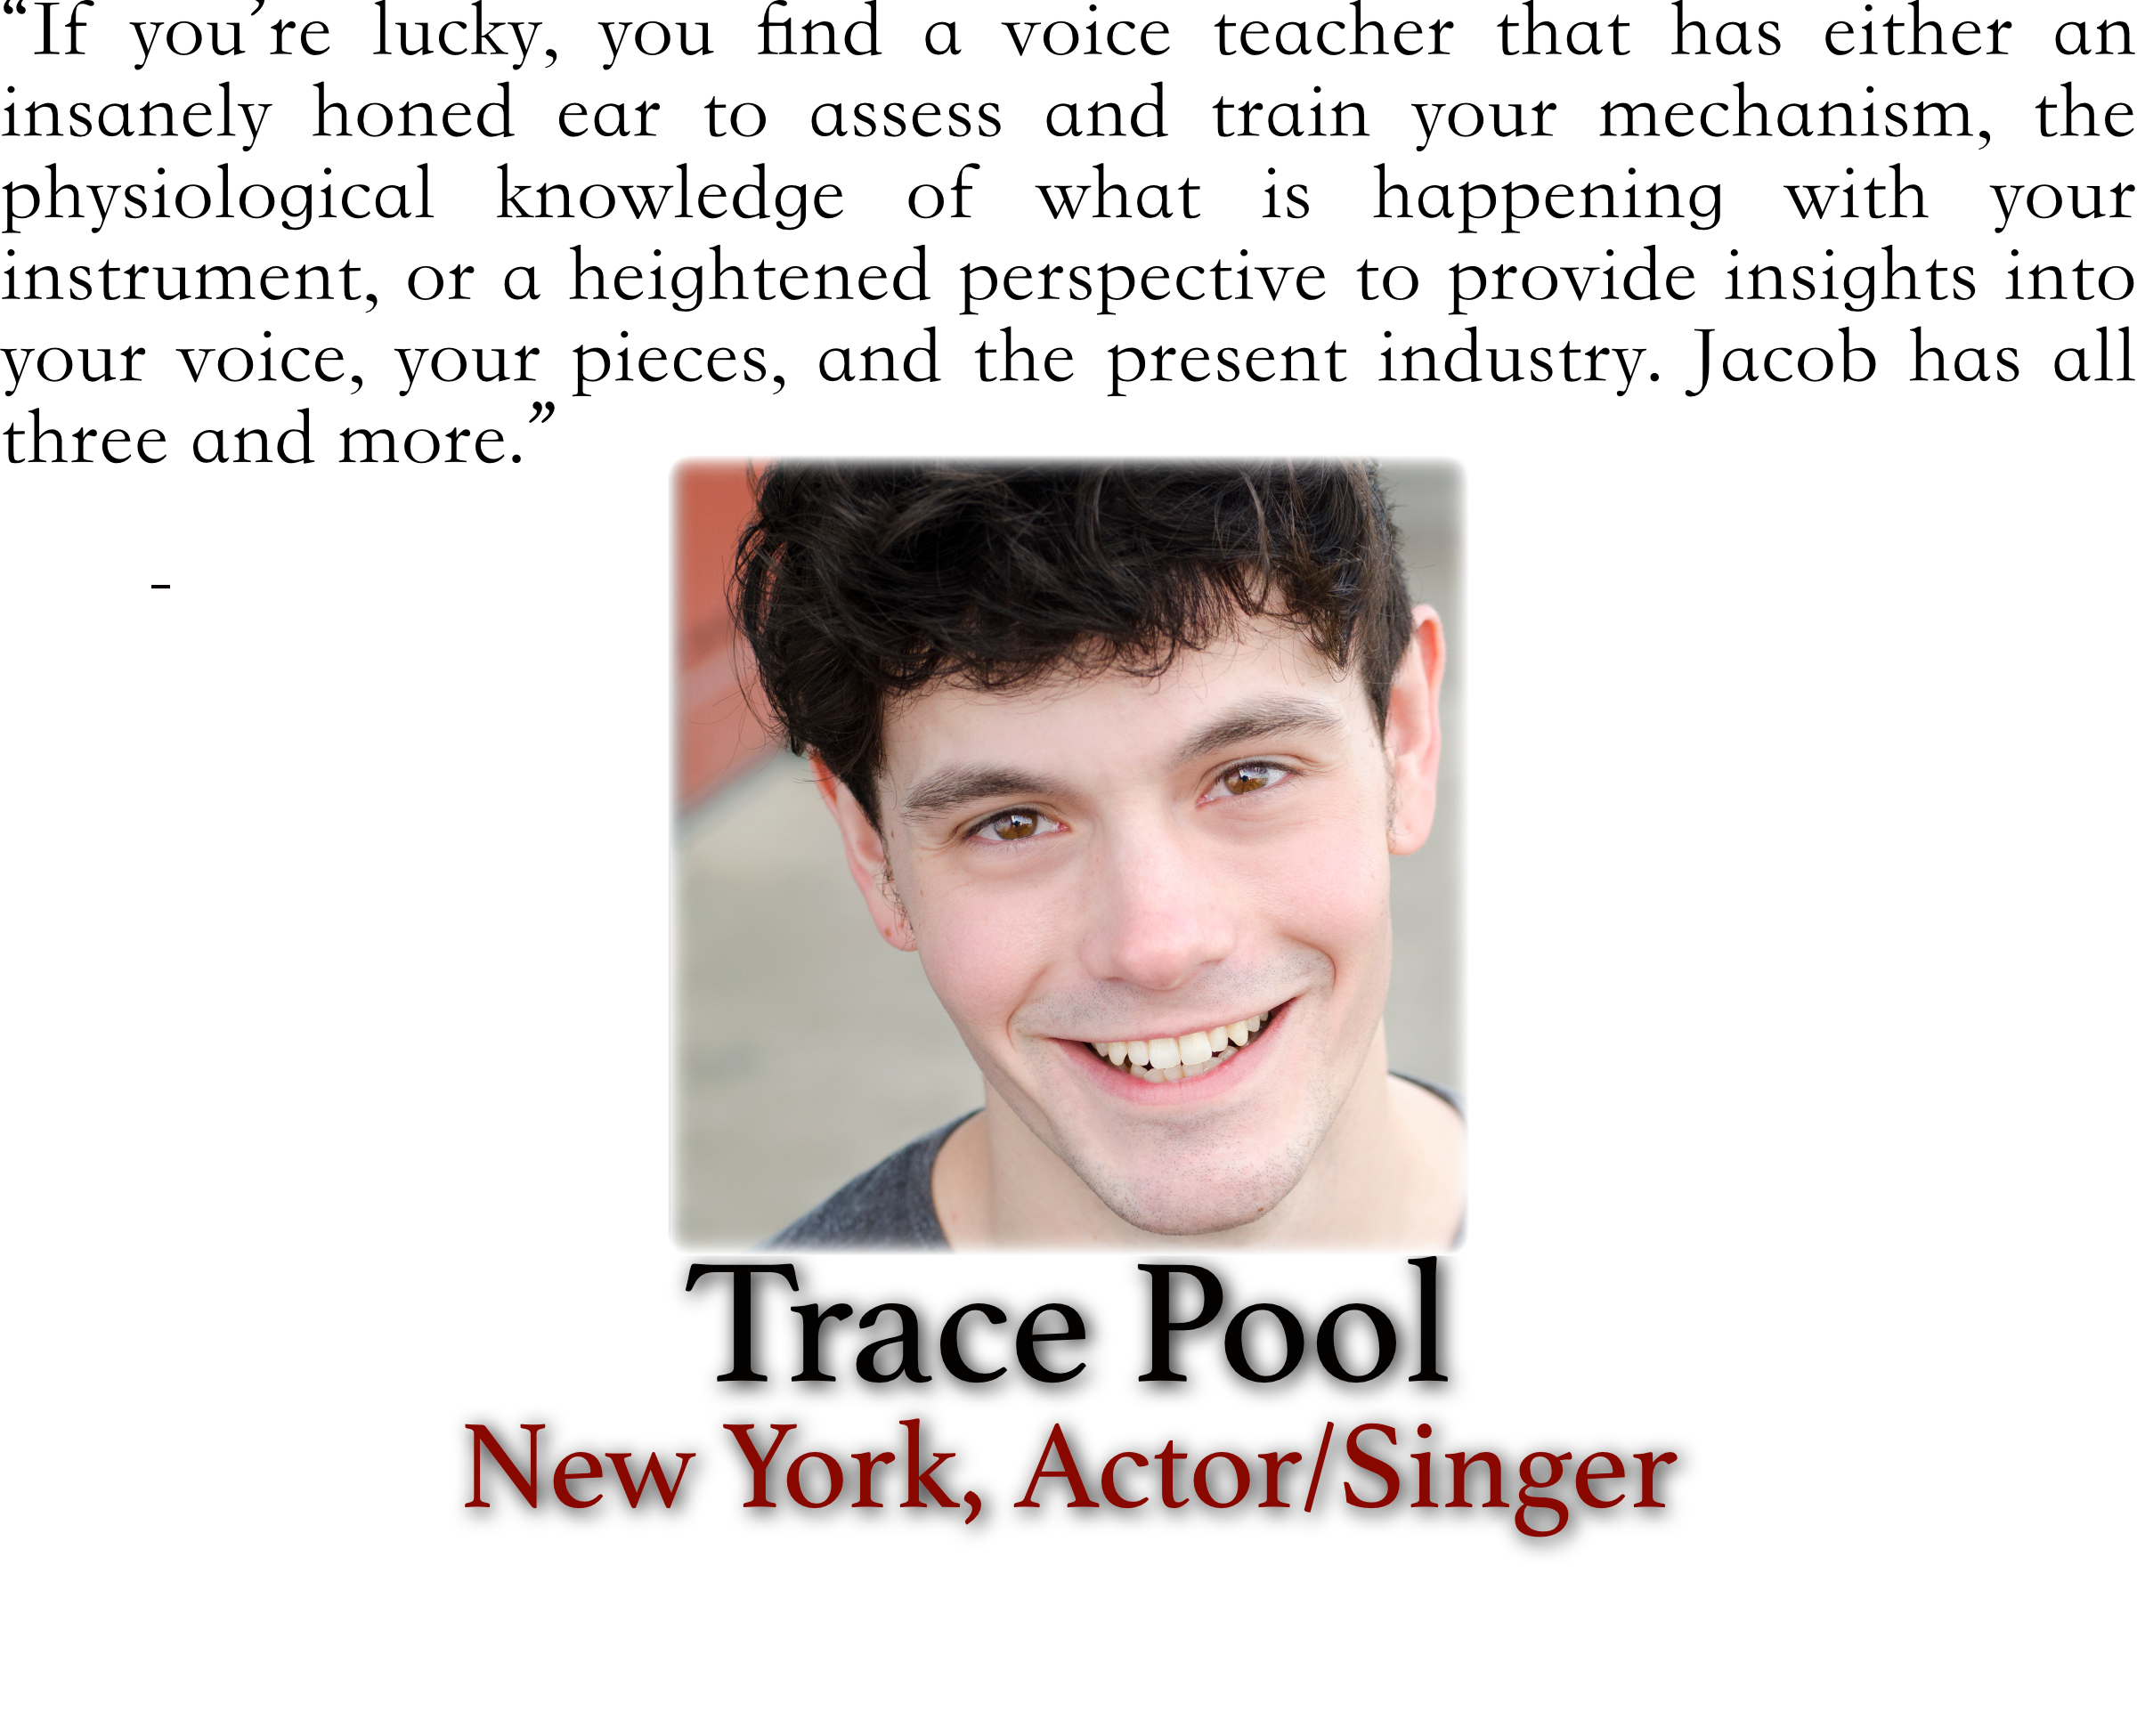 Trace Pool Testimonial.jpg